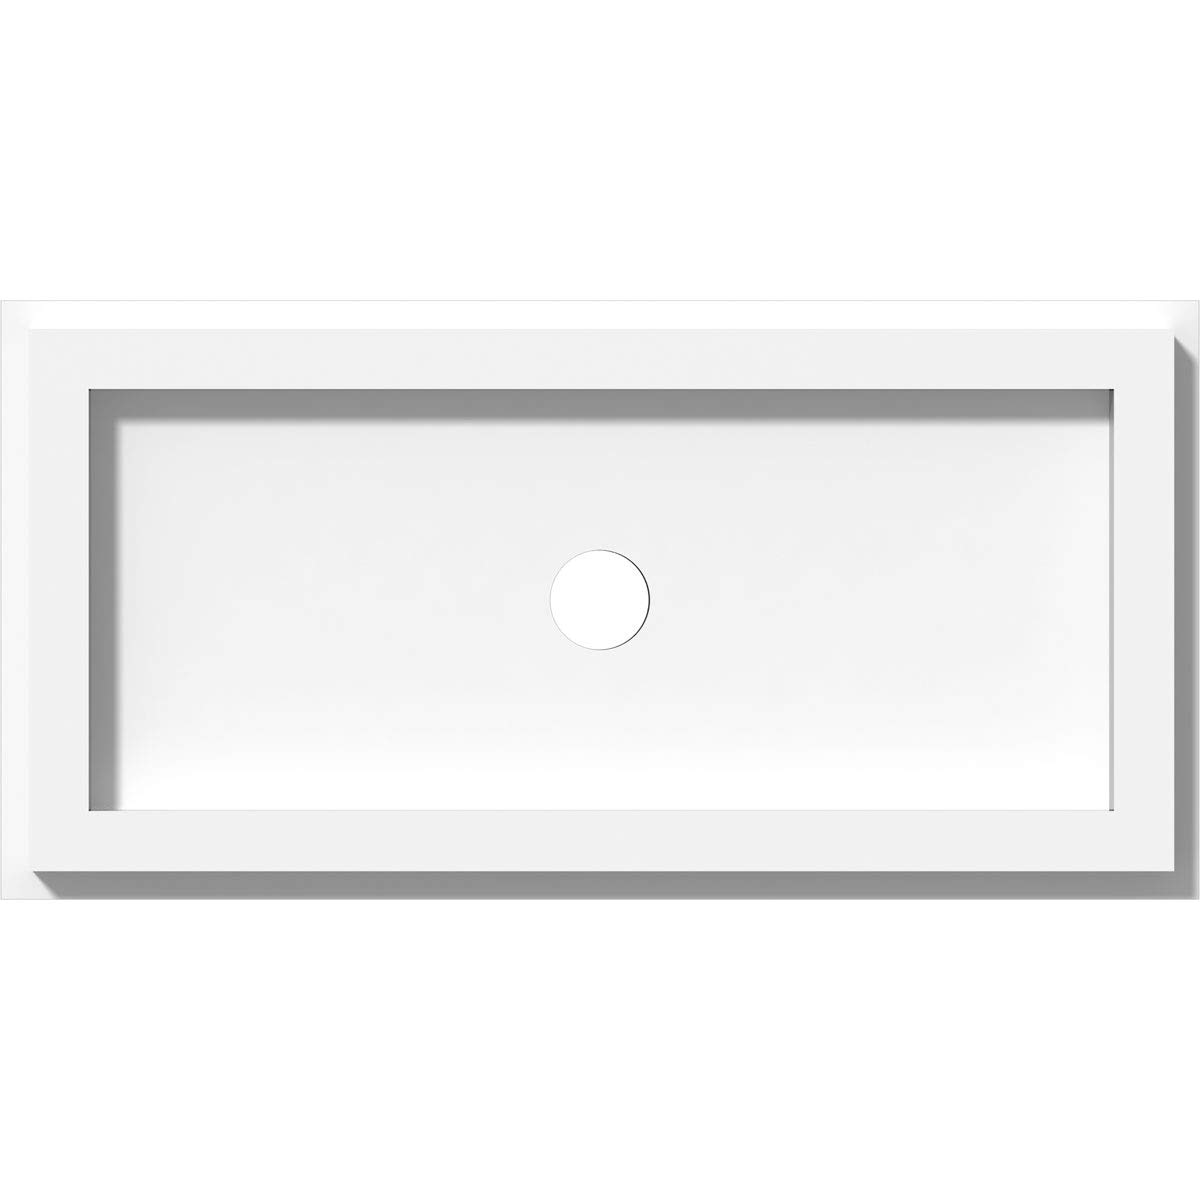 Ekena Millwork CMP12X6RE-01000 Ceiling Medallion 12W x 6H x 1ID x 4C x 1P White